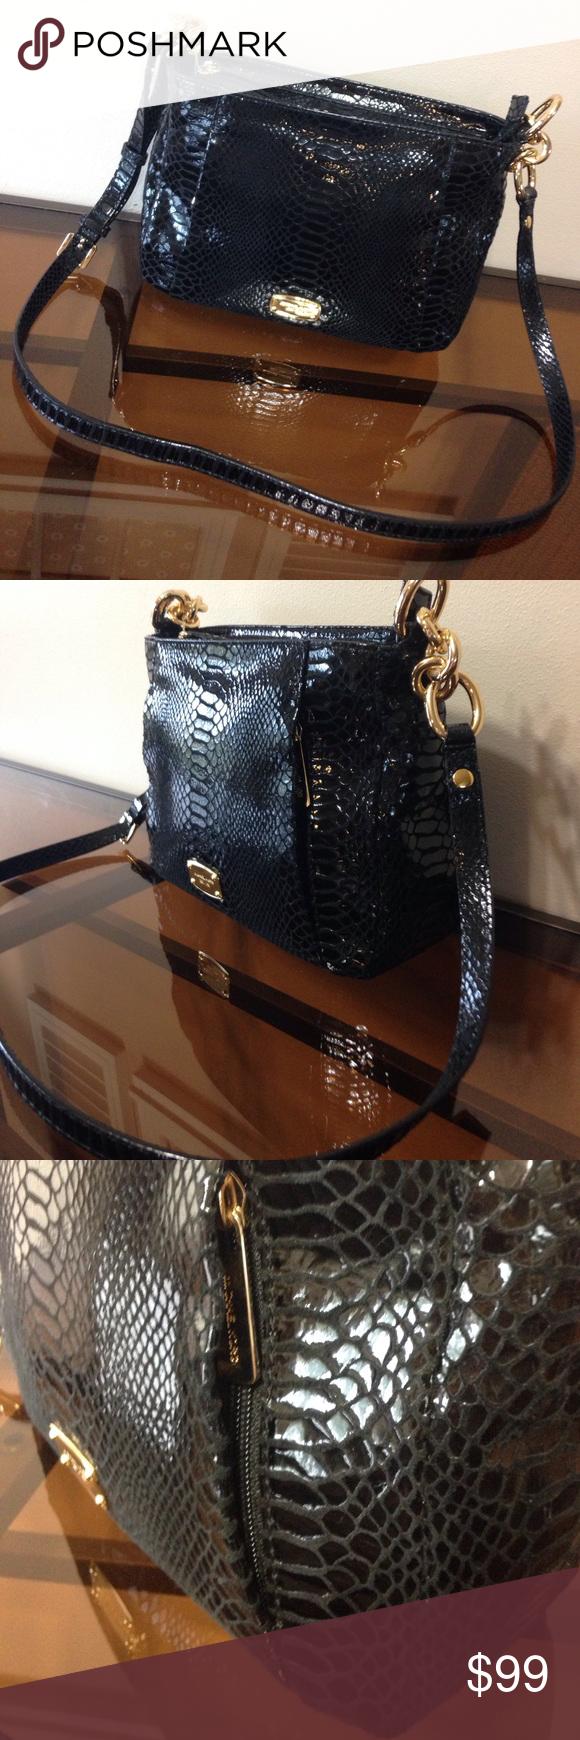 e58300fae776 MK HALLIE BLACK PYTHON MD MESSENGER CROSSBODY NWOT. 🚫Price Is FIRM🚫 Michael  Kors Bags Crossbody Bags